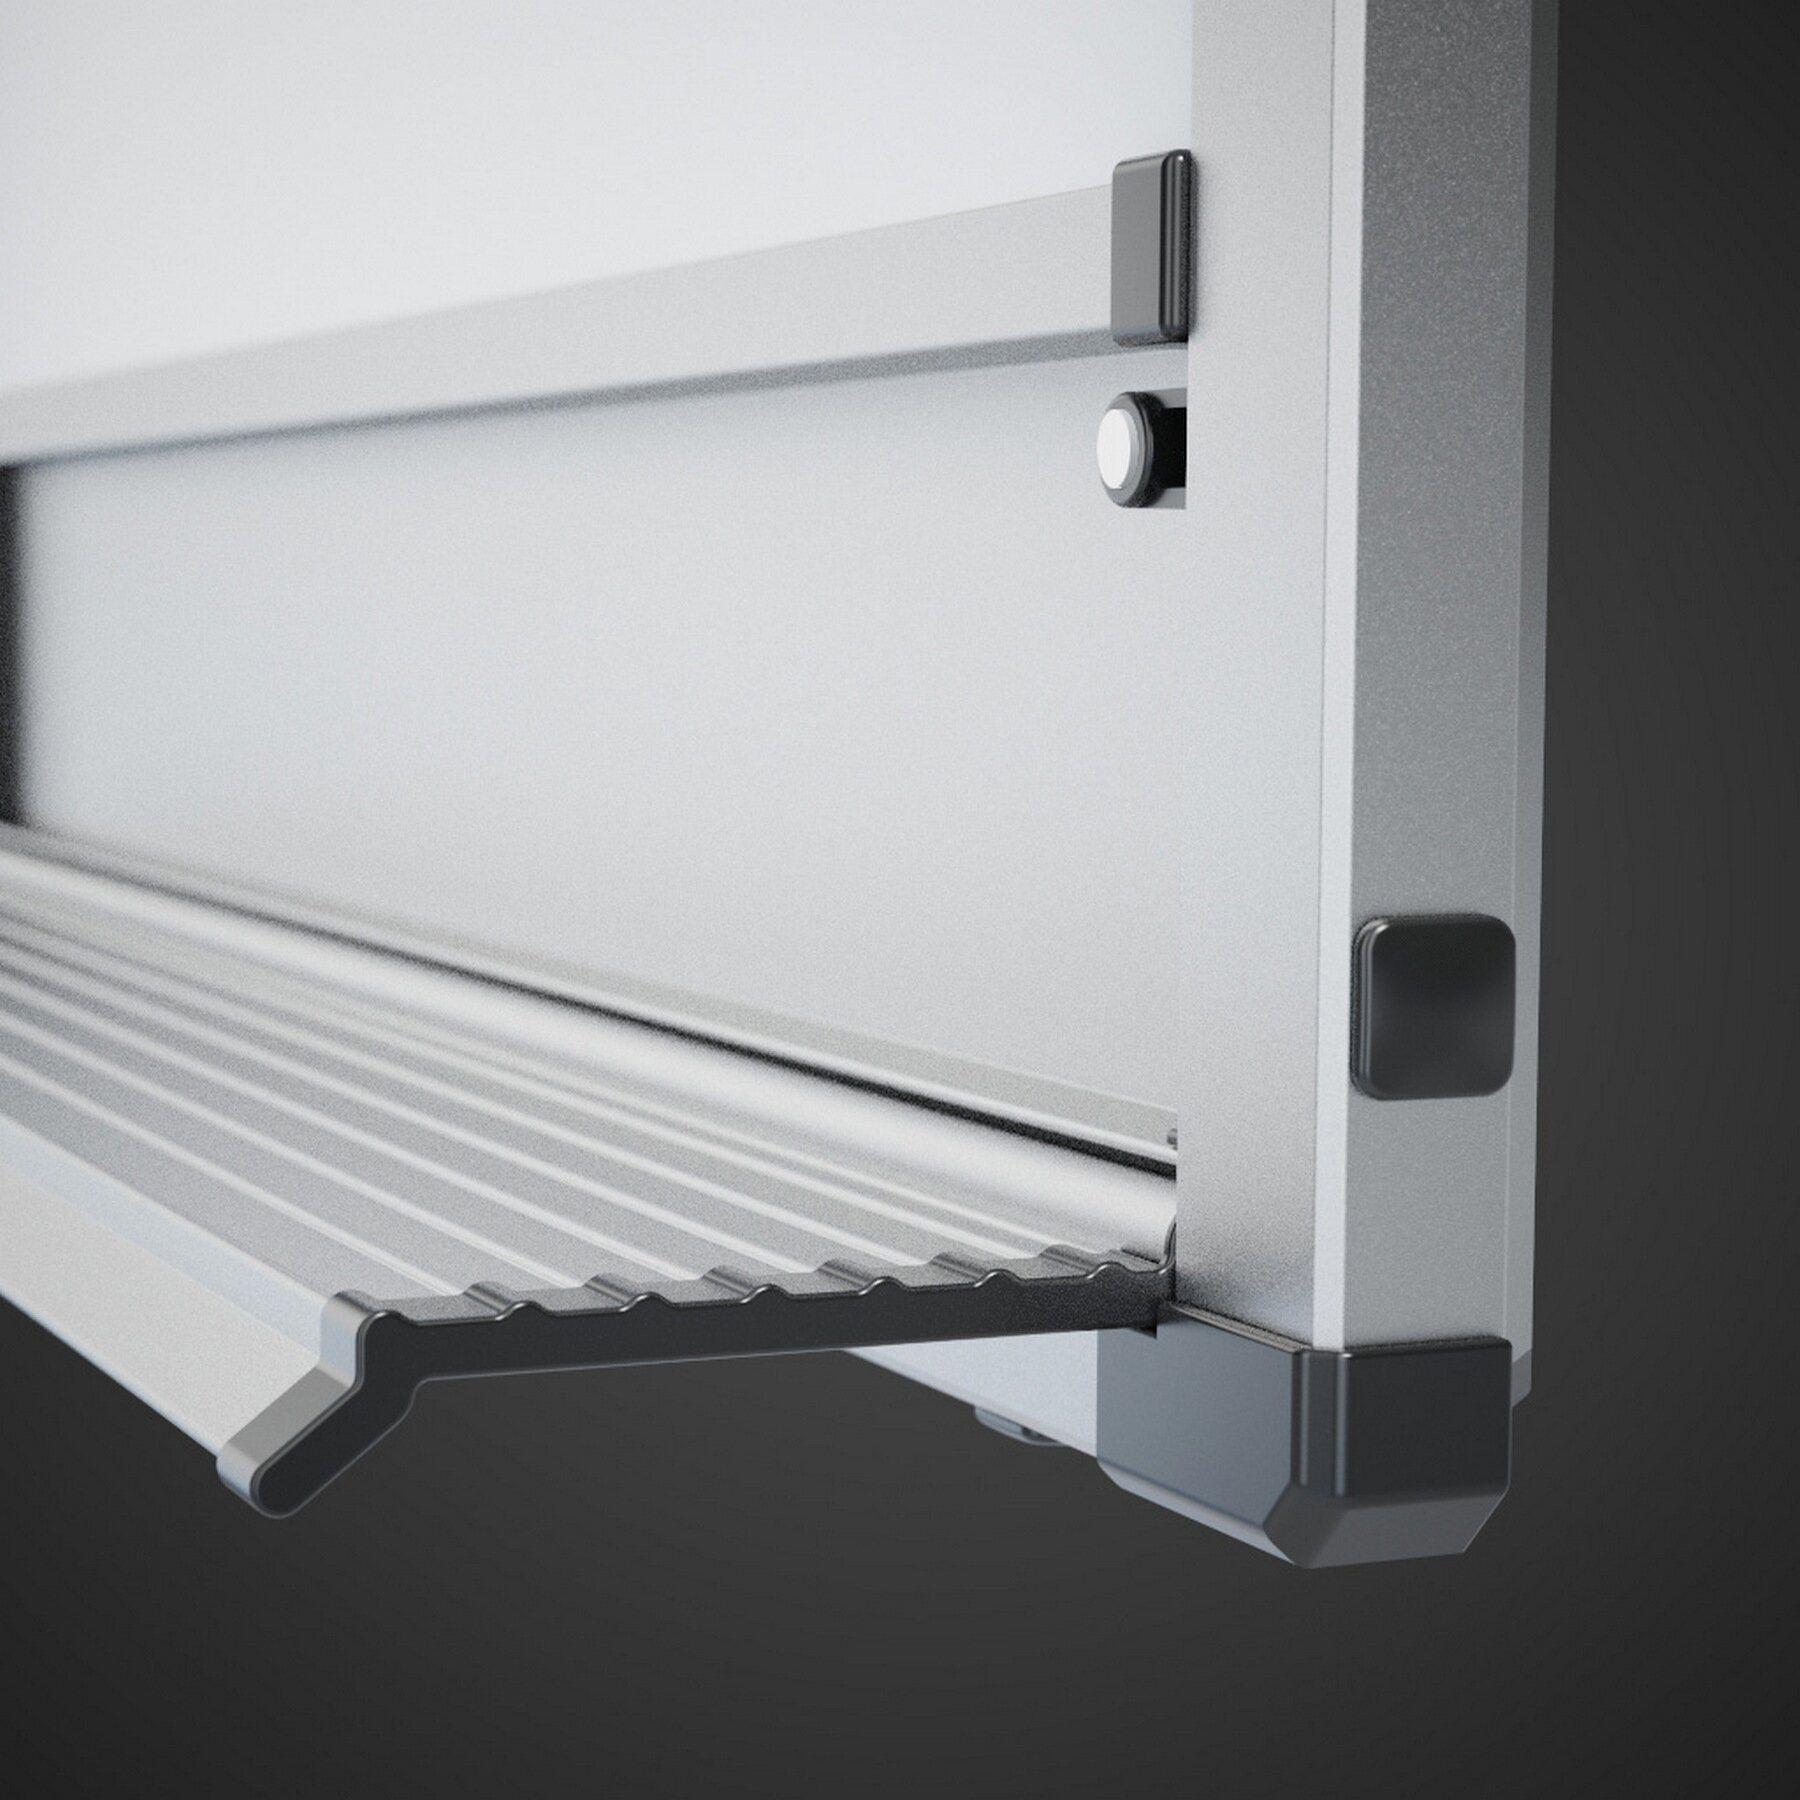 Доска белая магнитная сухостираемая StarBoard 100*150см., алюминиевая рамка, керамика 2x3 - фото 1